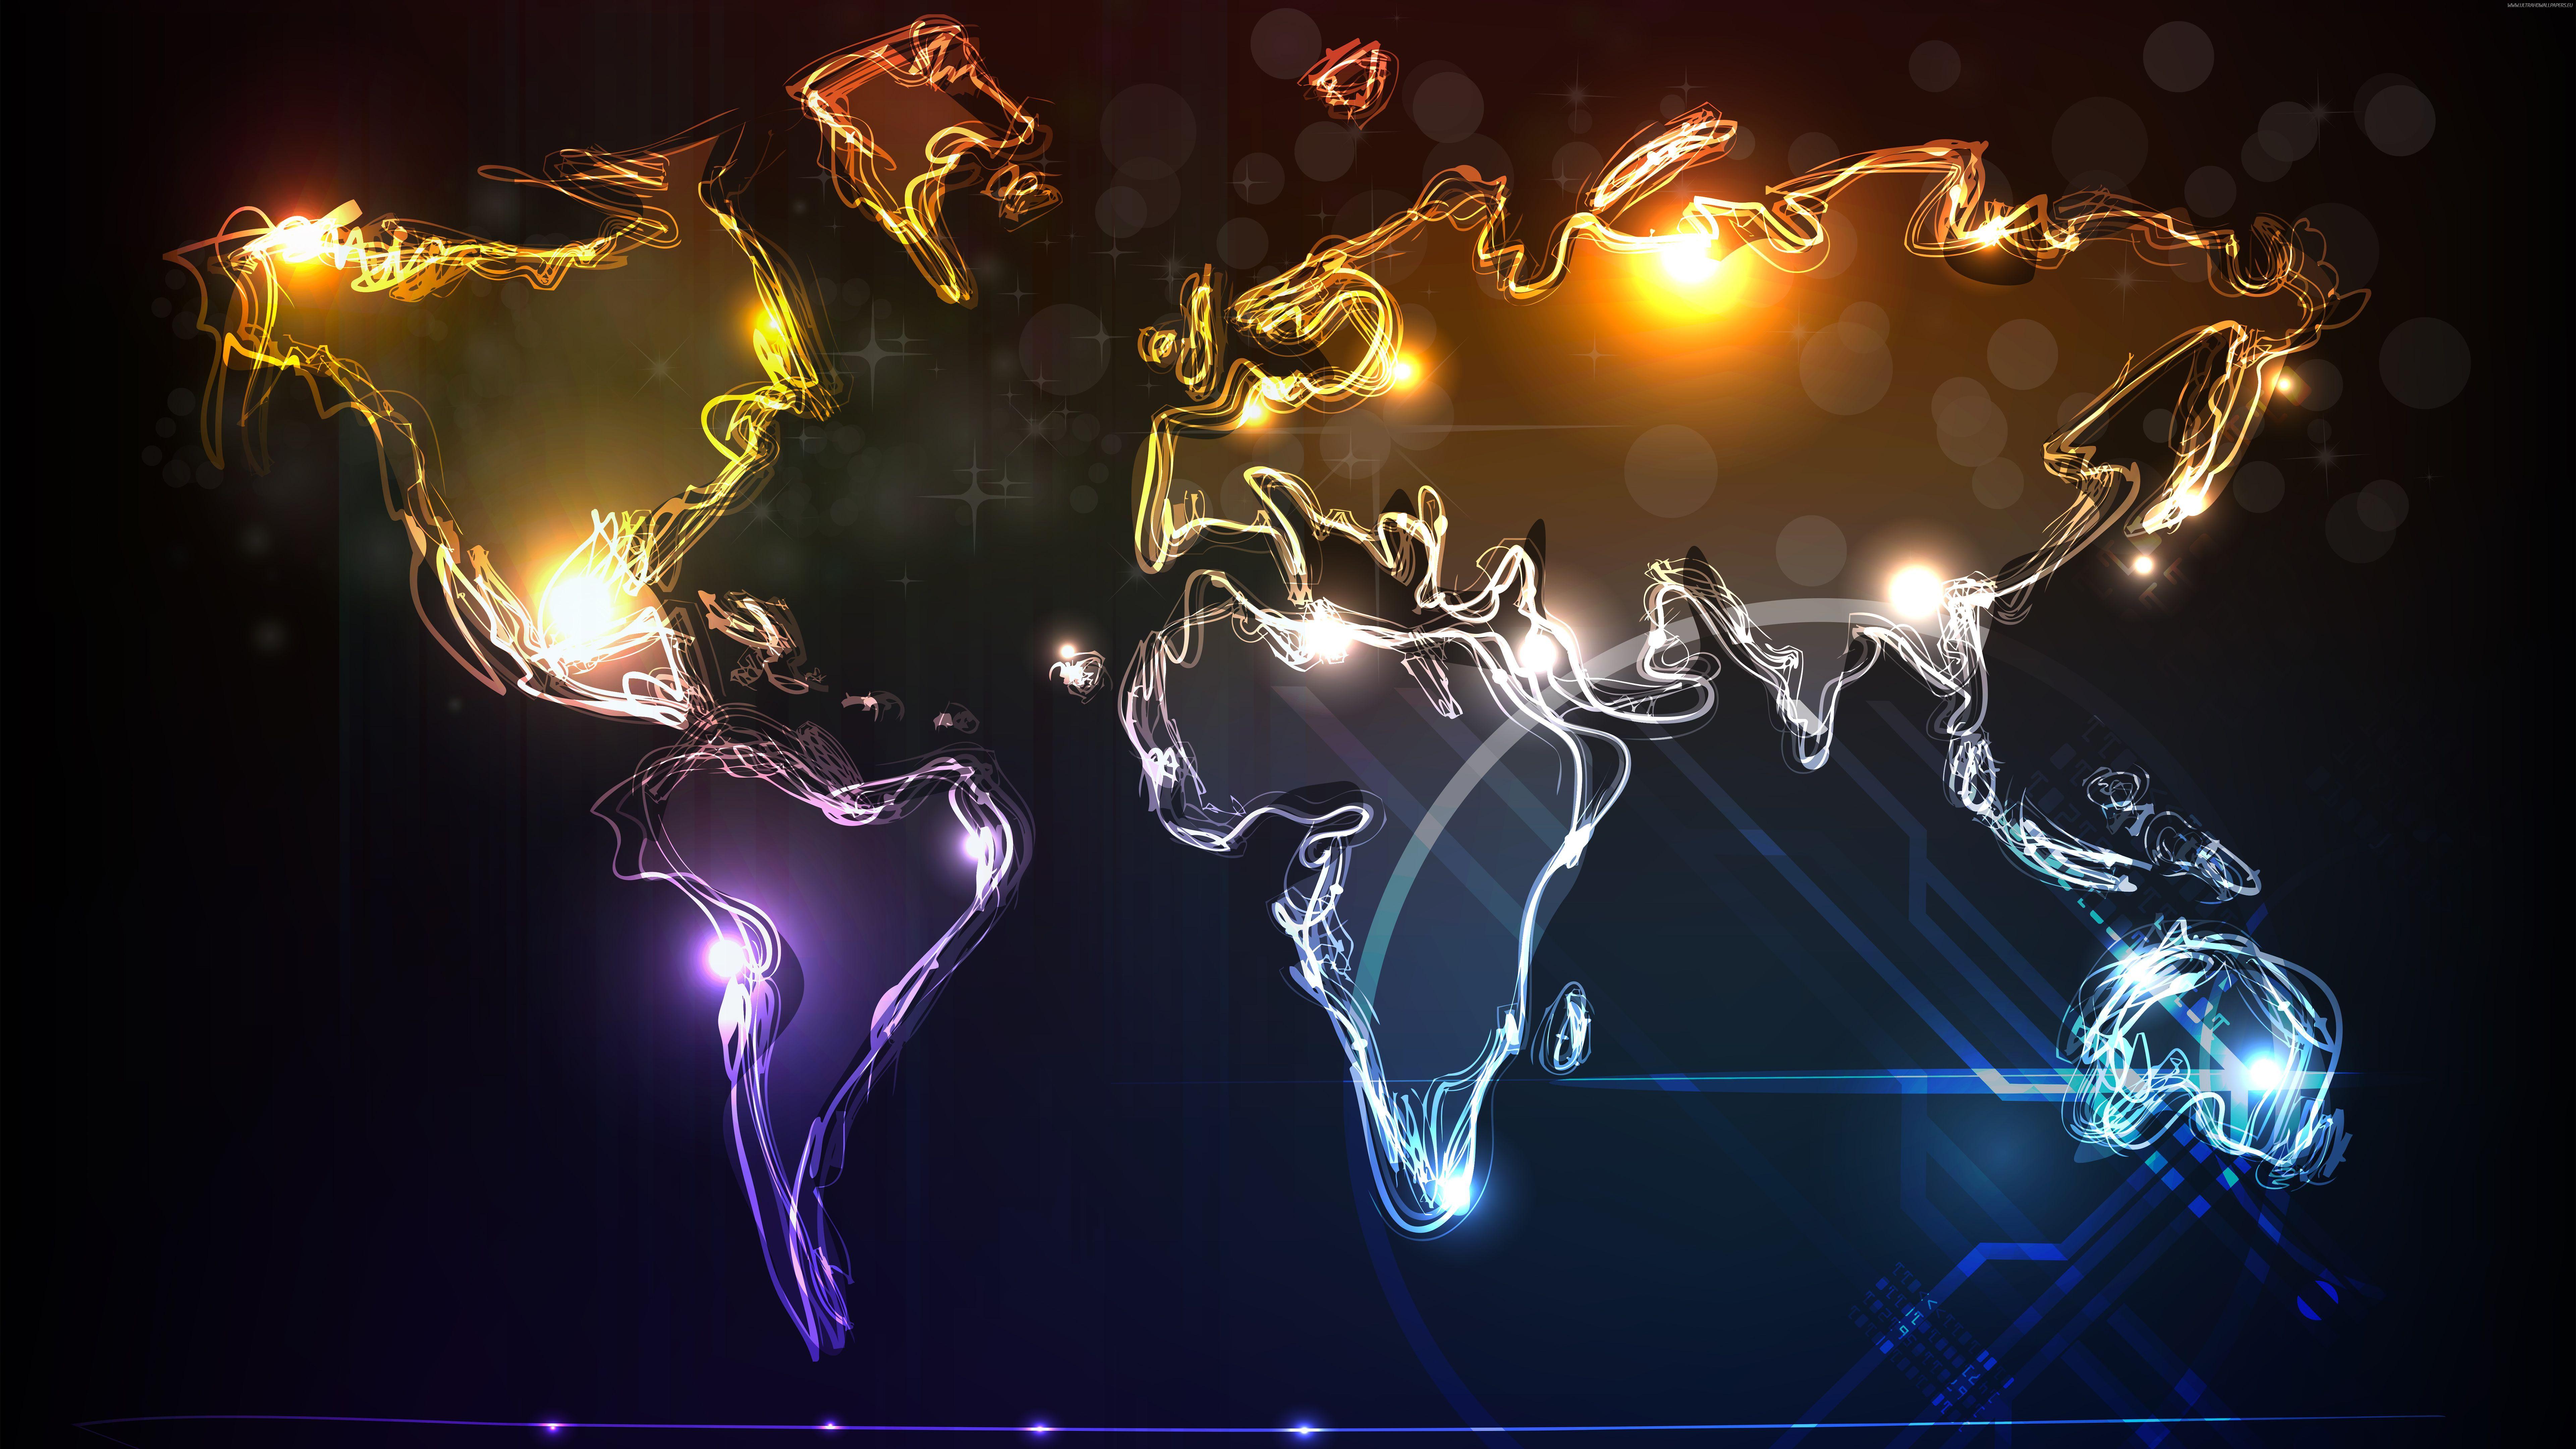 Free ultra hd wallpapers 8k 7680x4320 4k 3840x2160 wallpaper world map neon lights gumiabroncs Choice Image